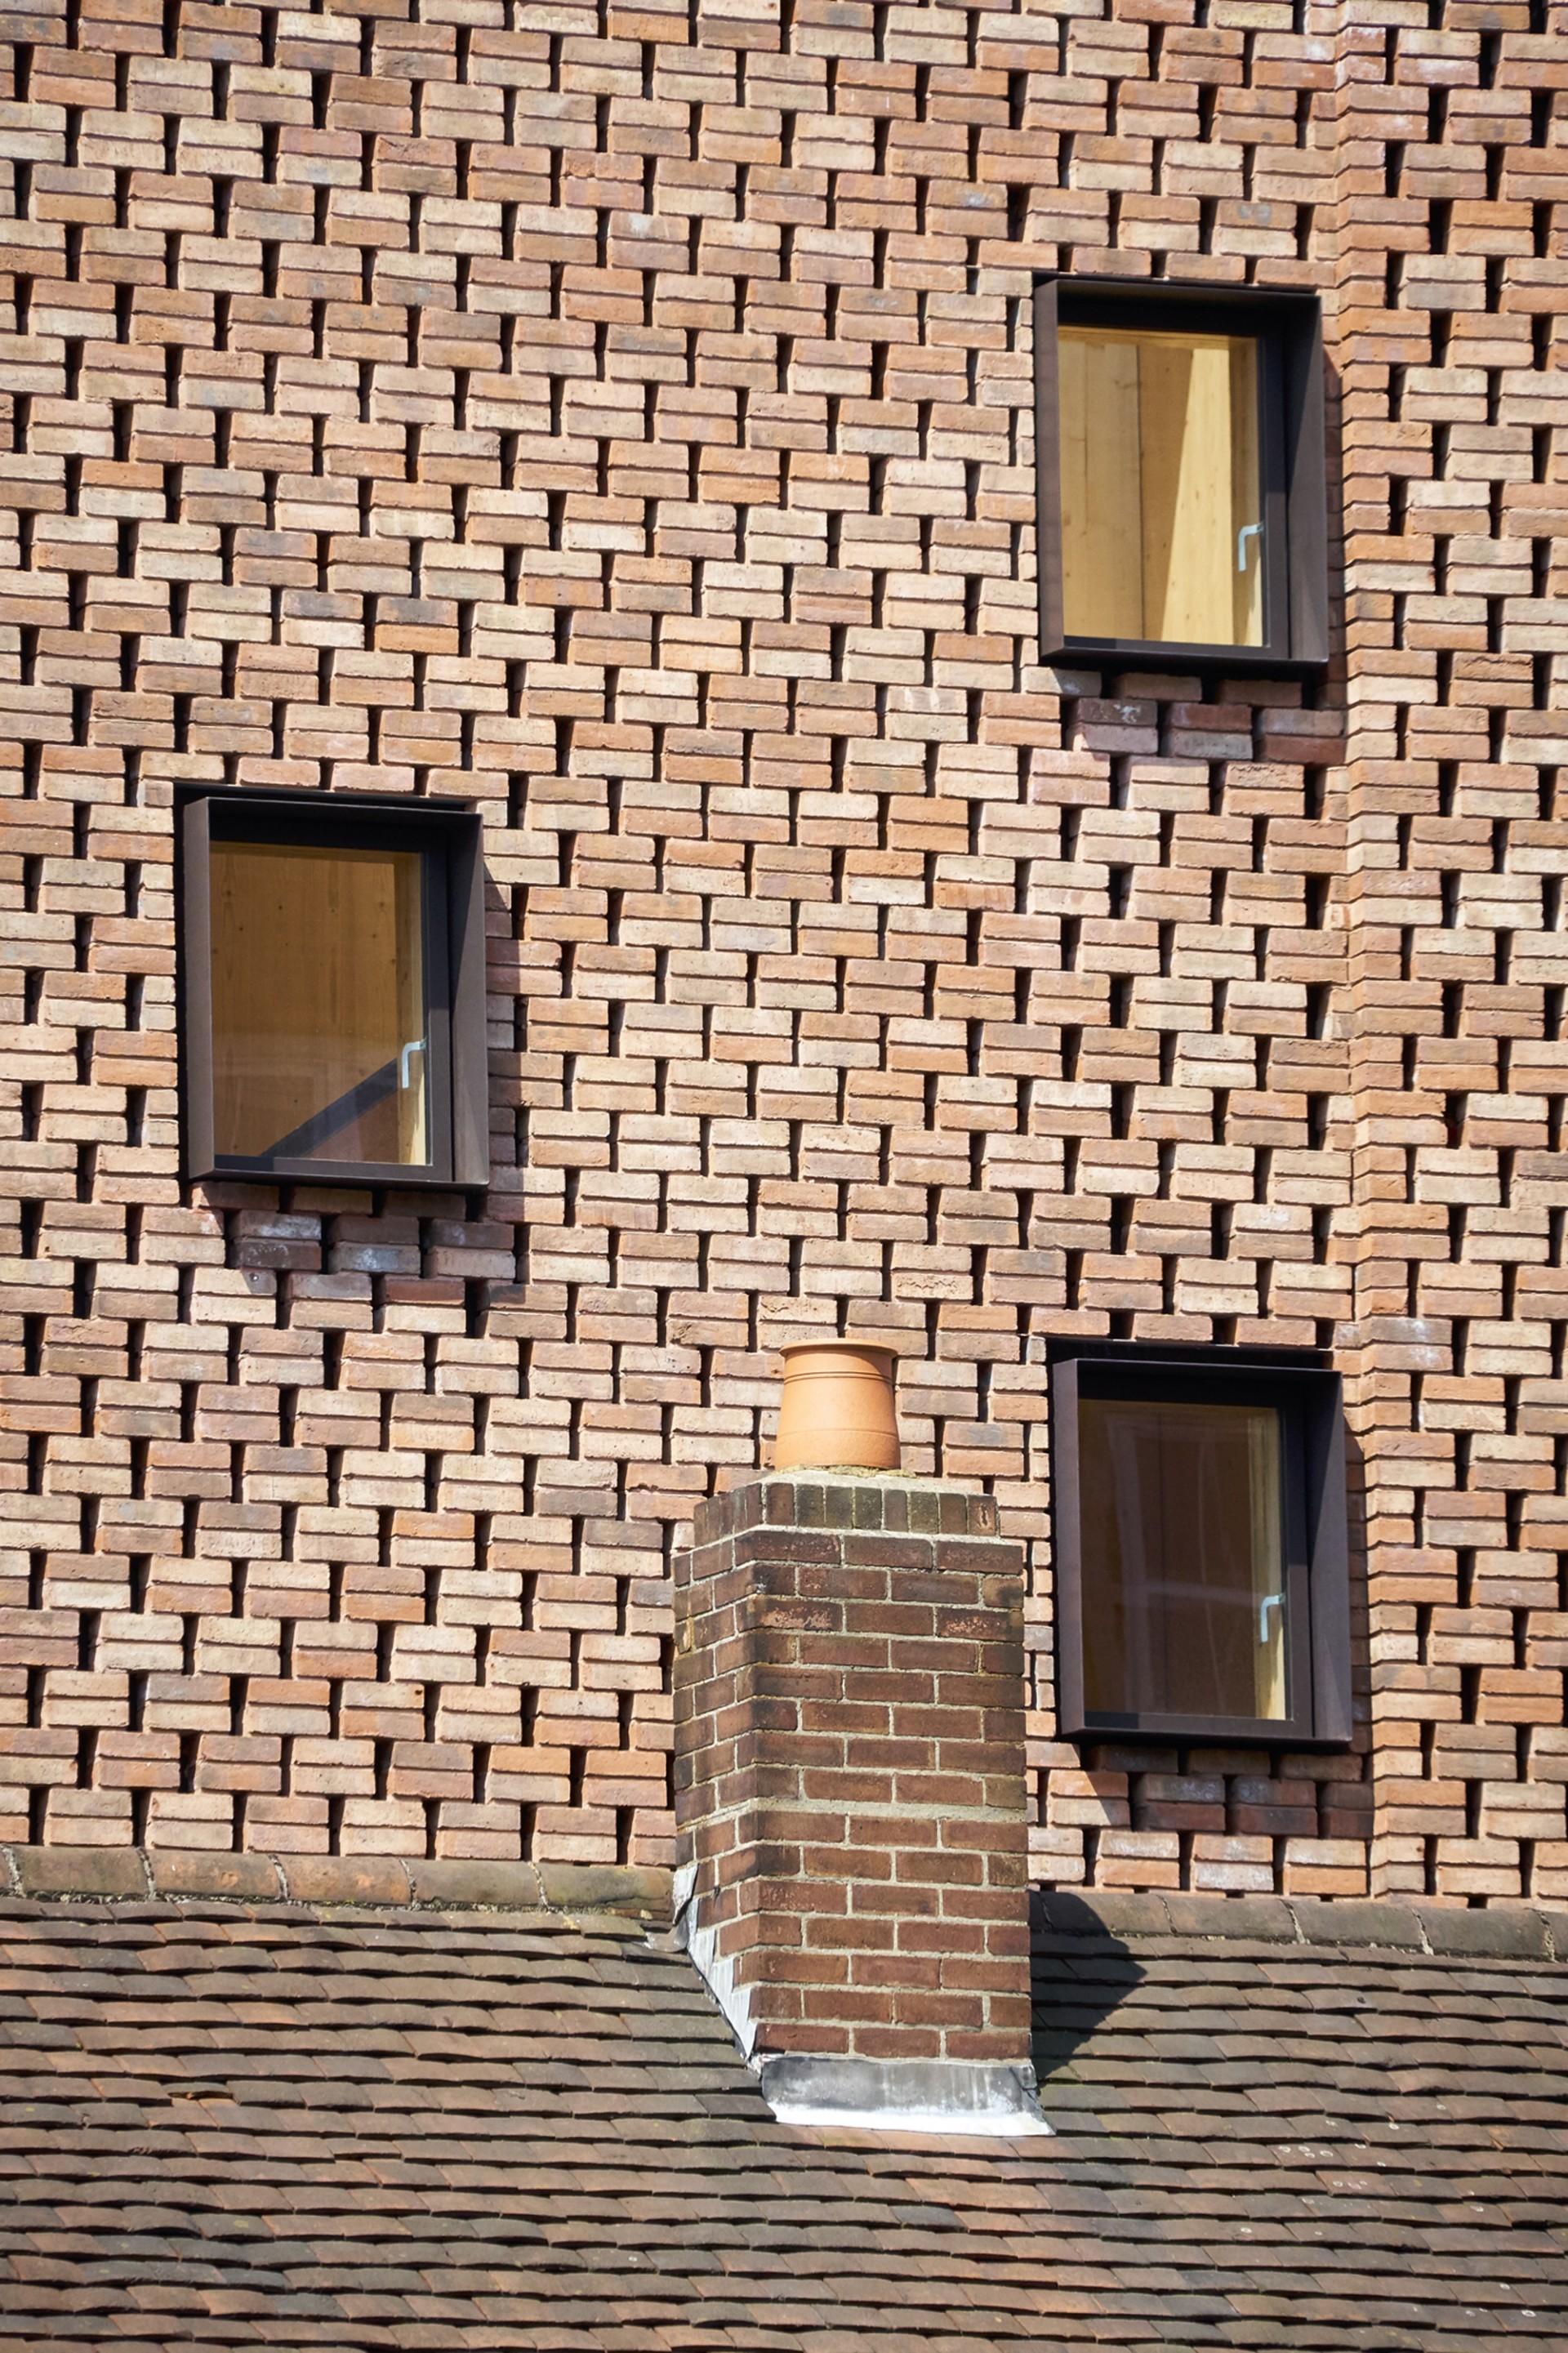 Amin Taha + Groupwork Barretts Grove London